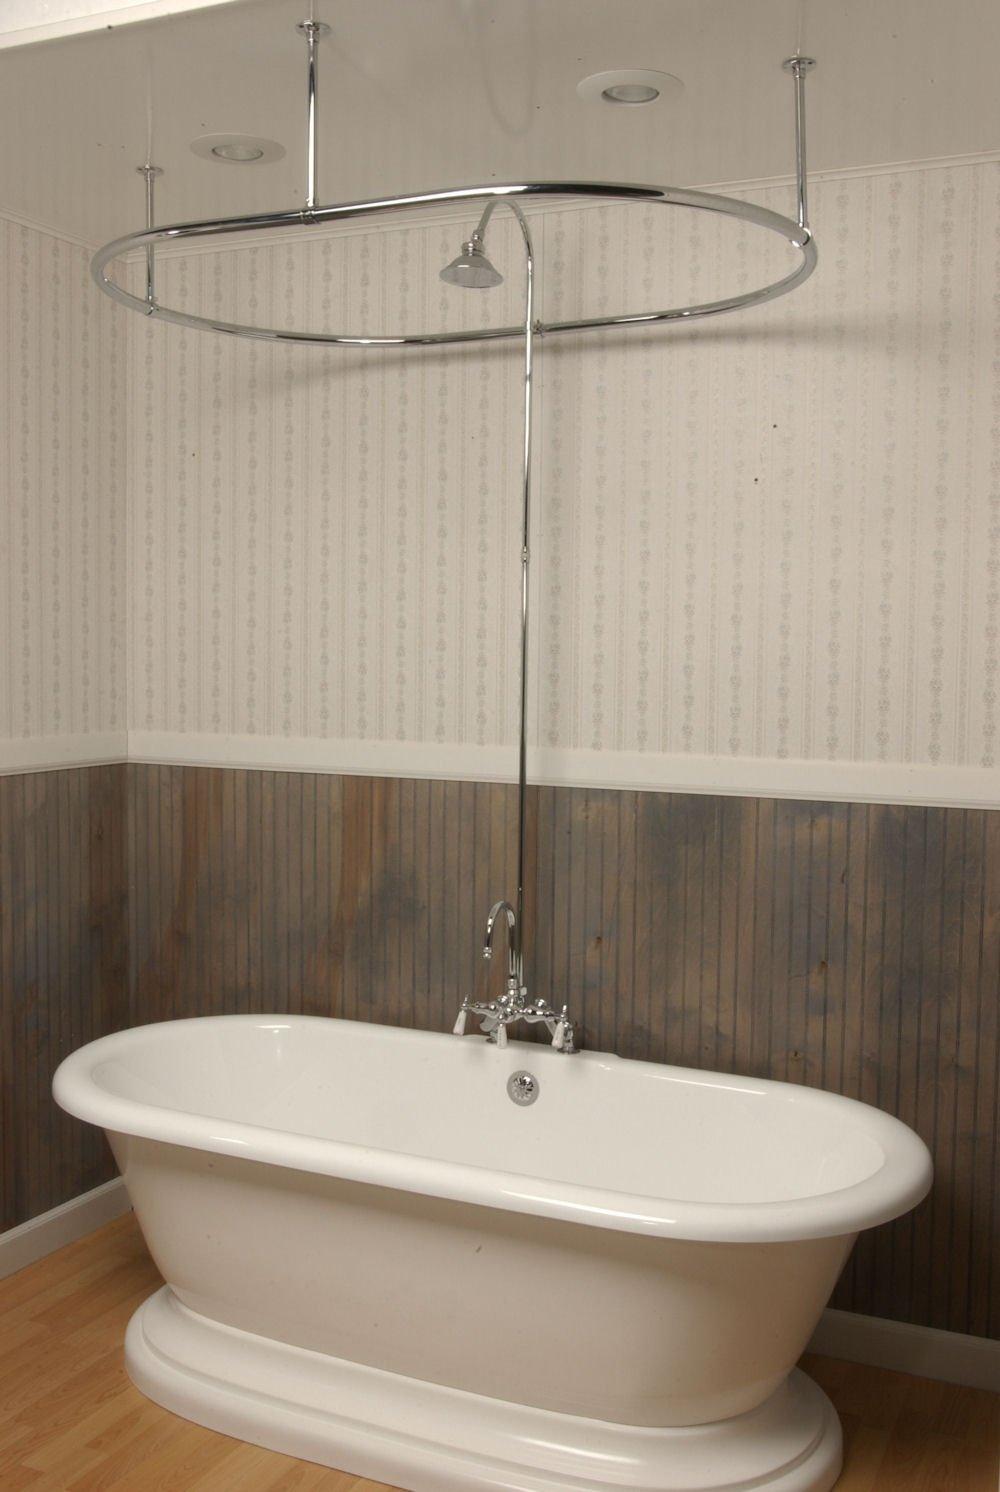 10 Unique Clawfoot Tub Shower Curtain Ideas